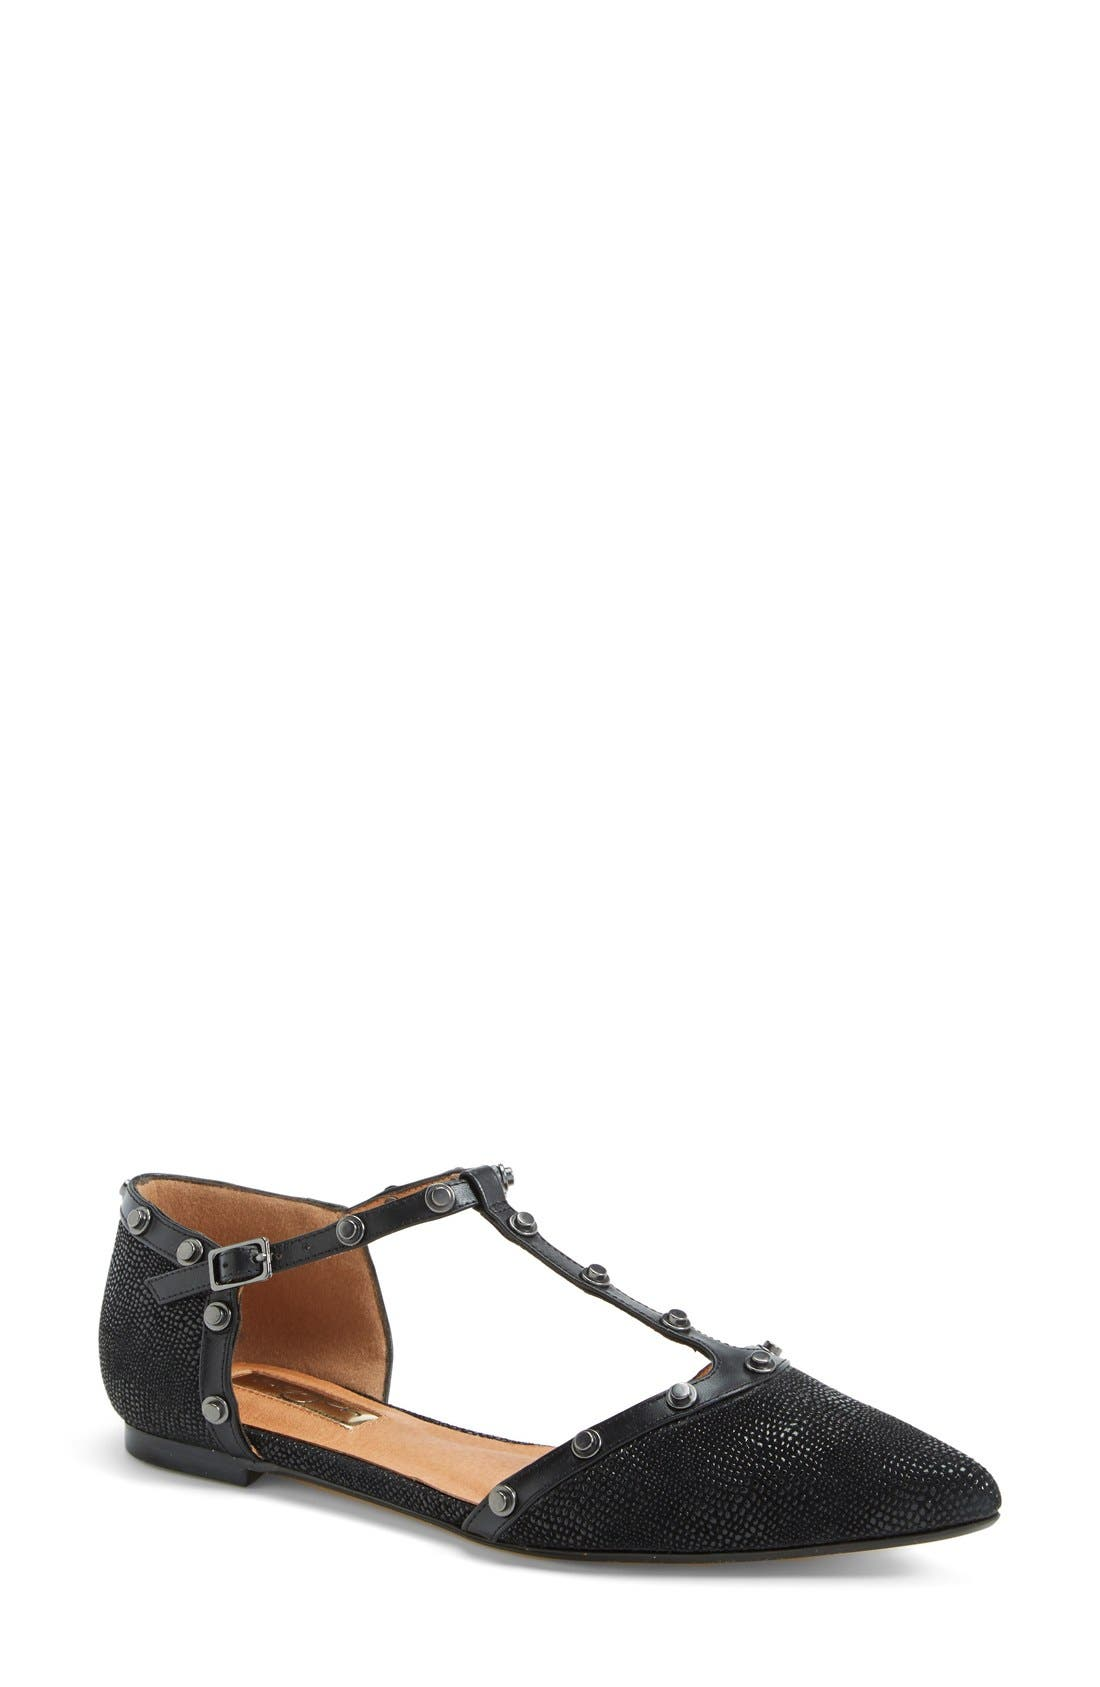 'Olson' Pointy Toe Studded T-Strap Flat,                             Main thumbnail 3, color,